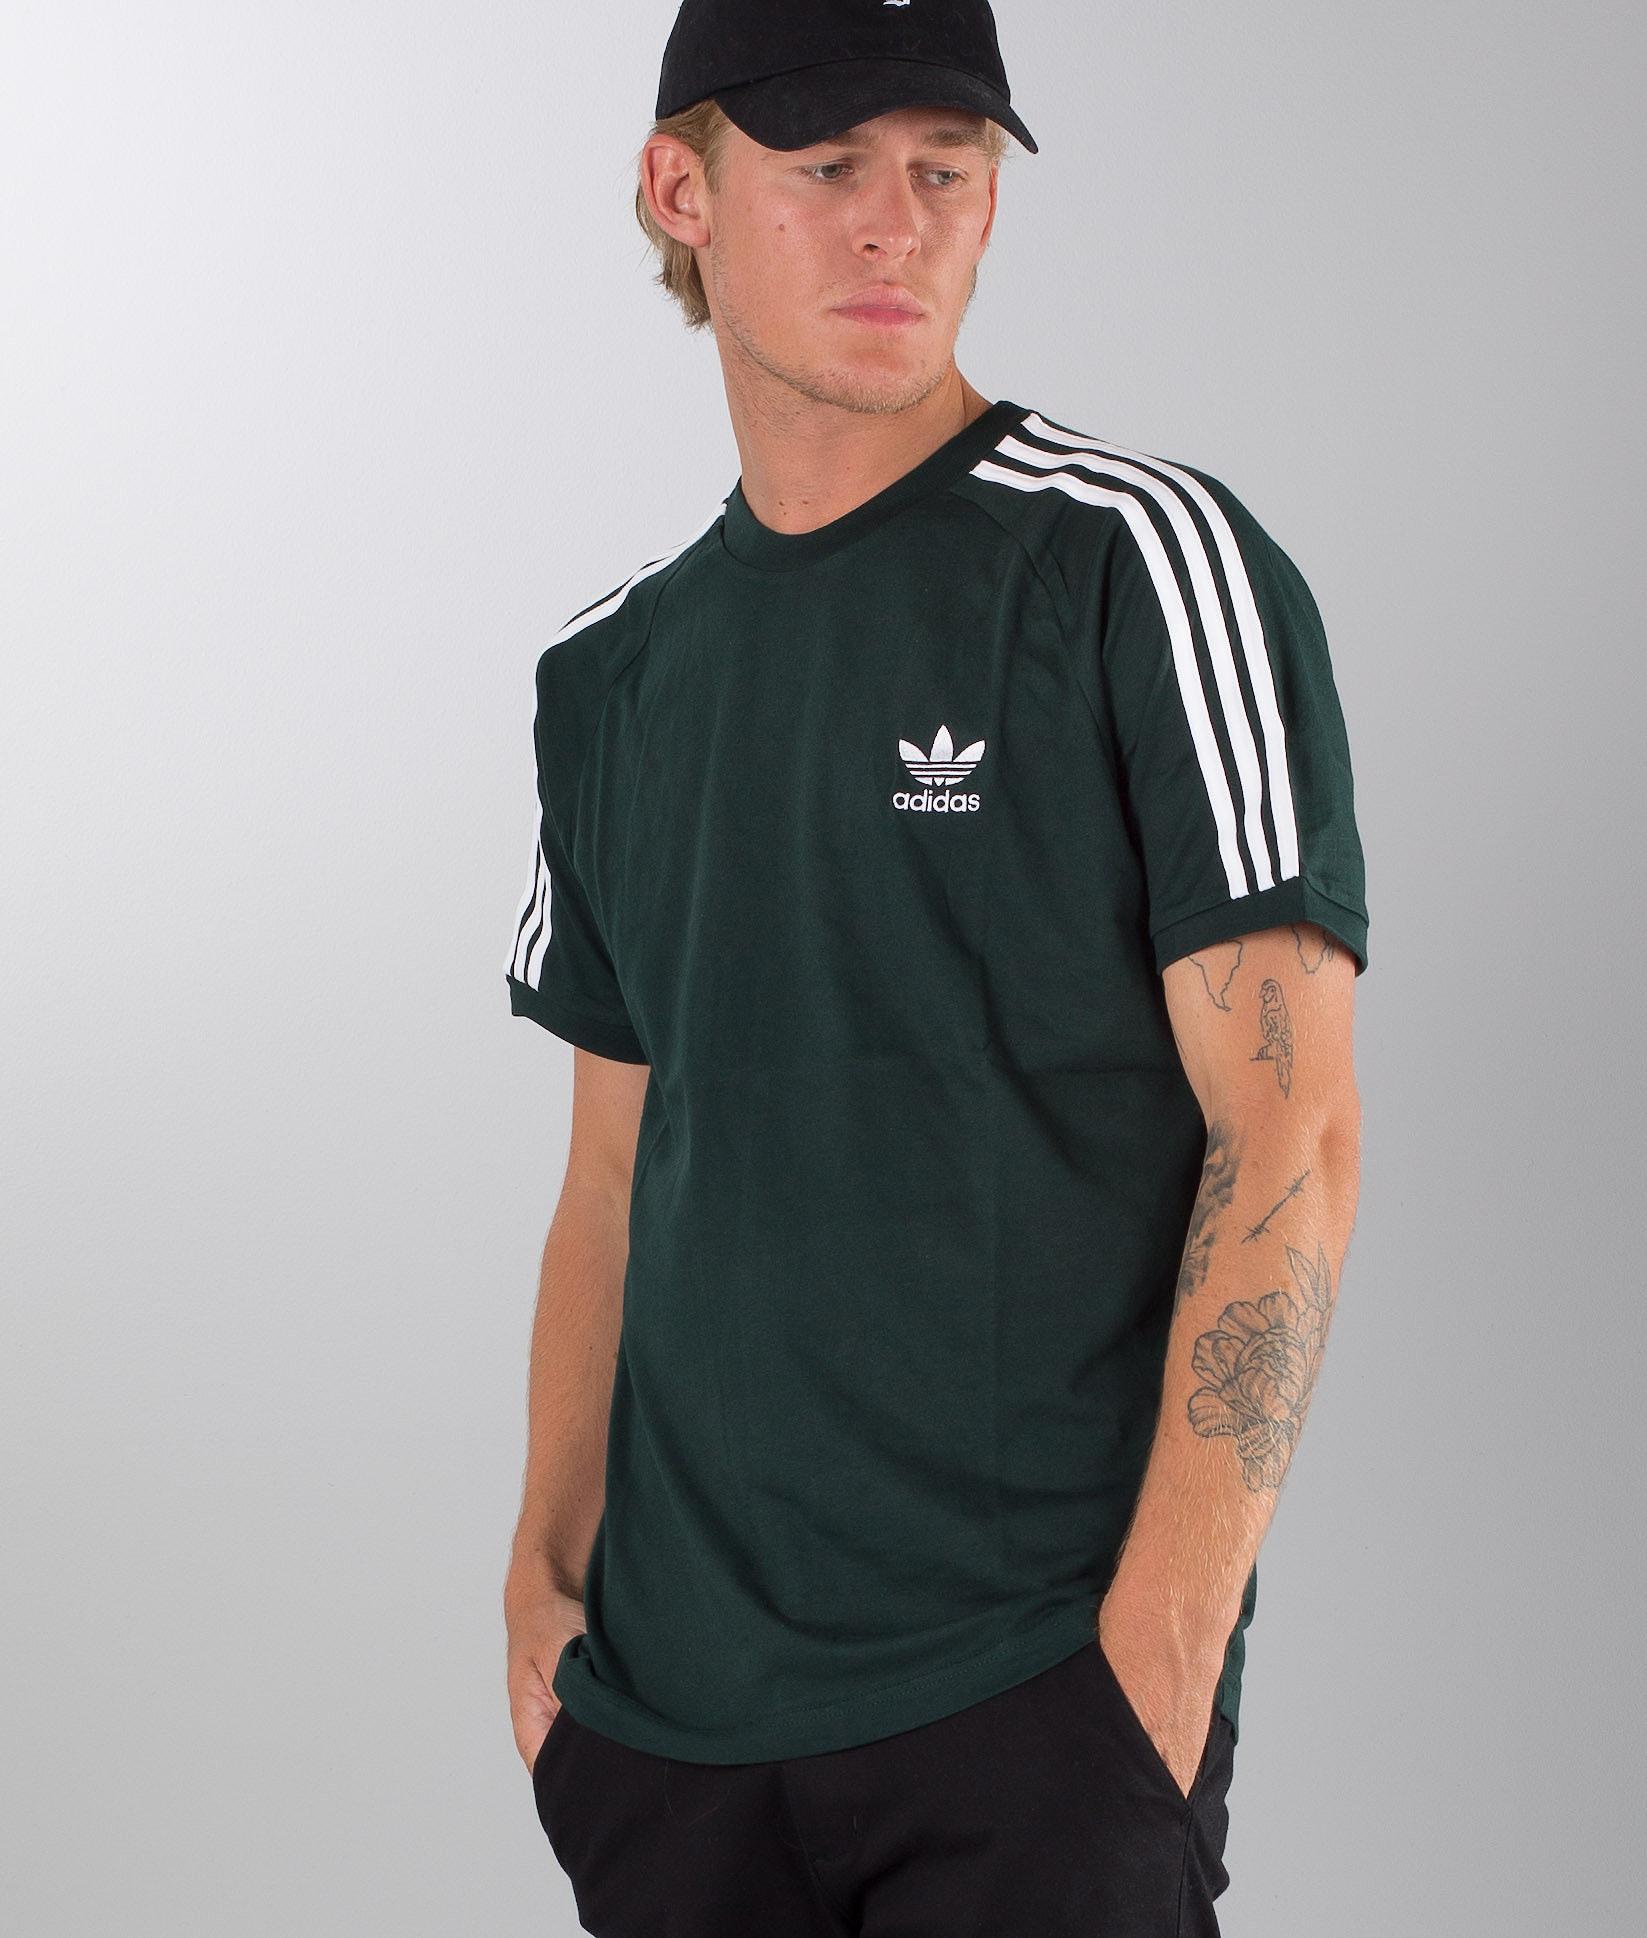 64122f7f269 Adidas Originals 3-Stripes T-shirt Green Night - Ridestore.com